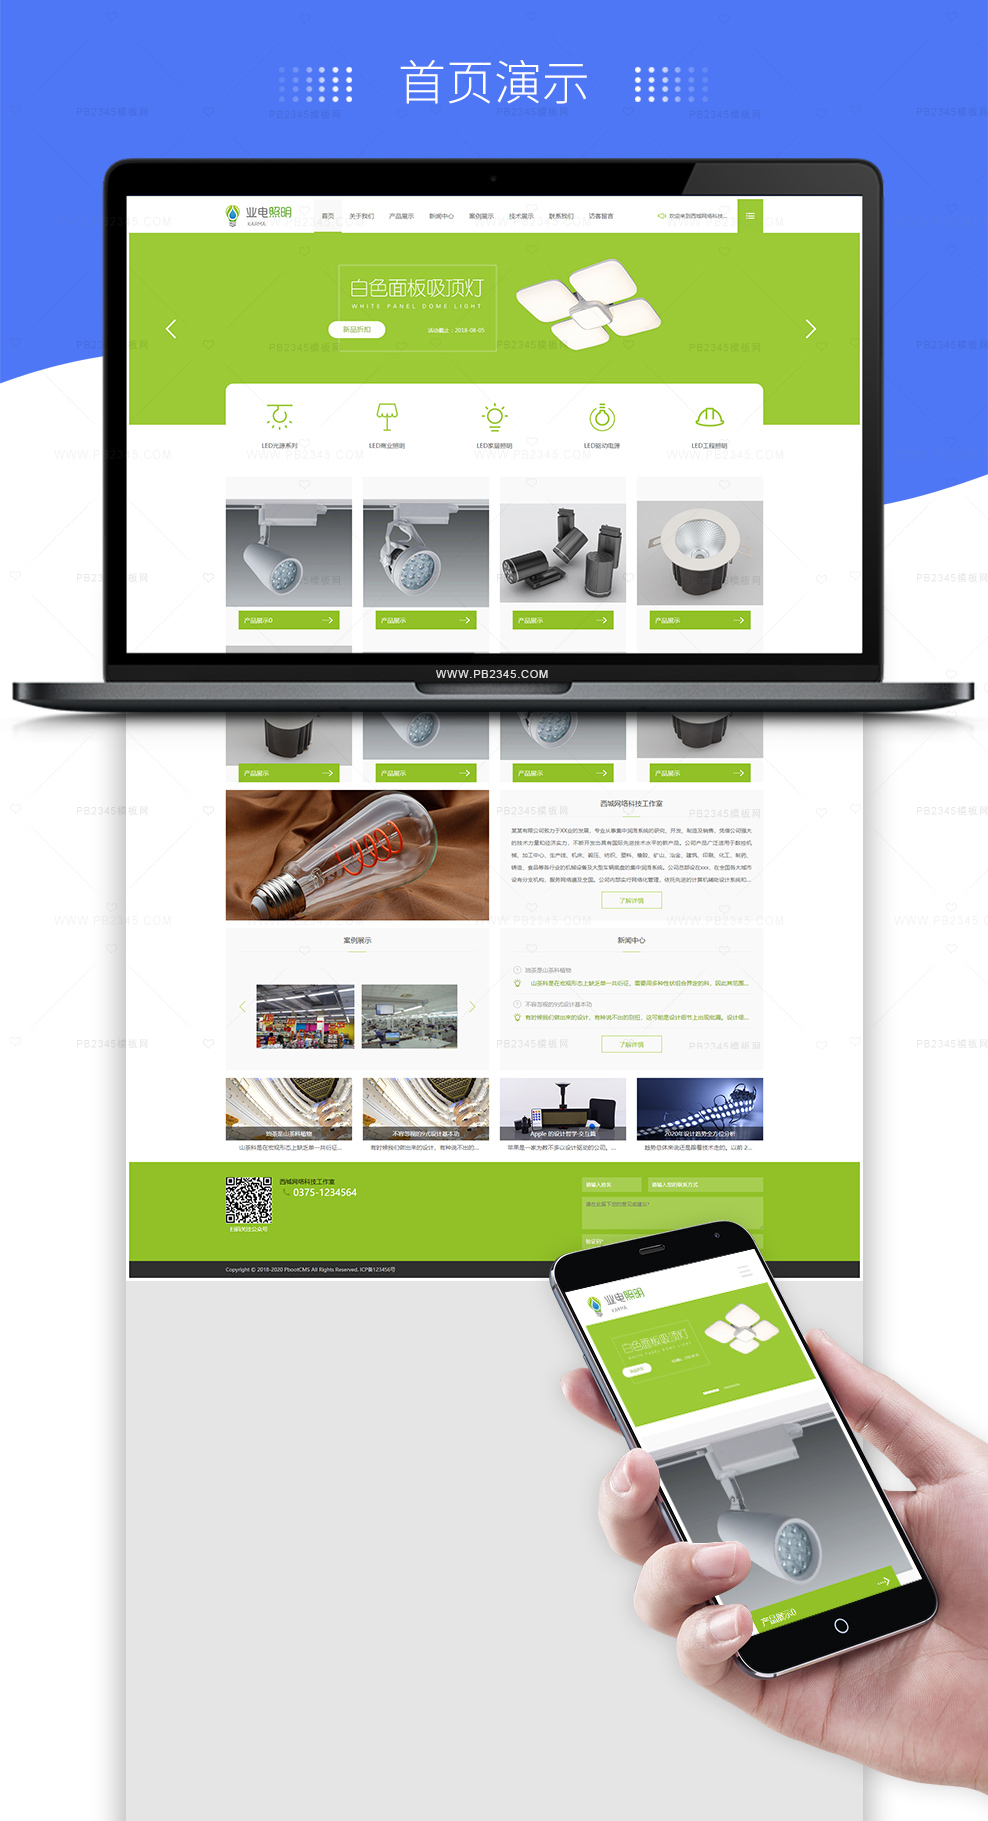 PBOOTCMS灯饰网站源码照明灯饰类网站模板灯具LED经销商网站源码